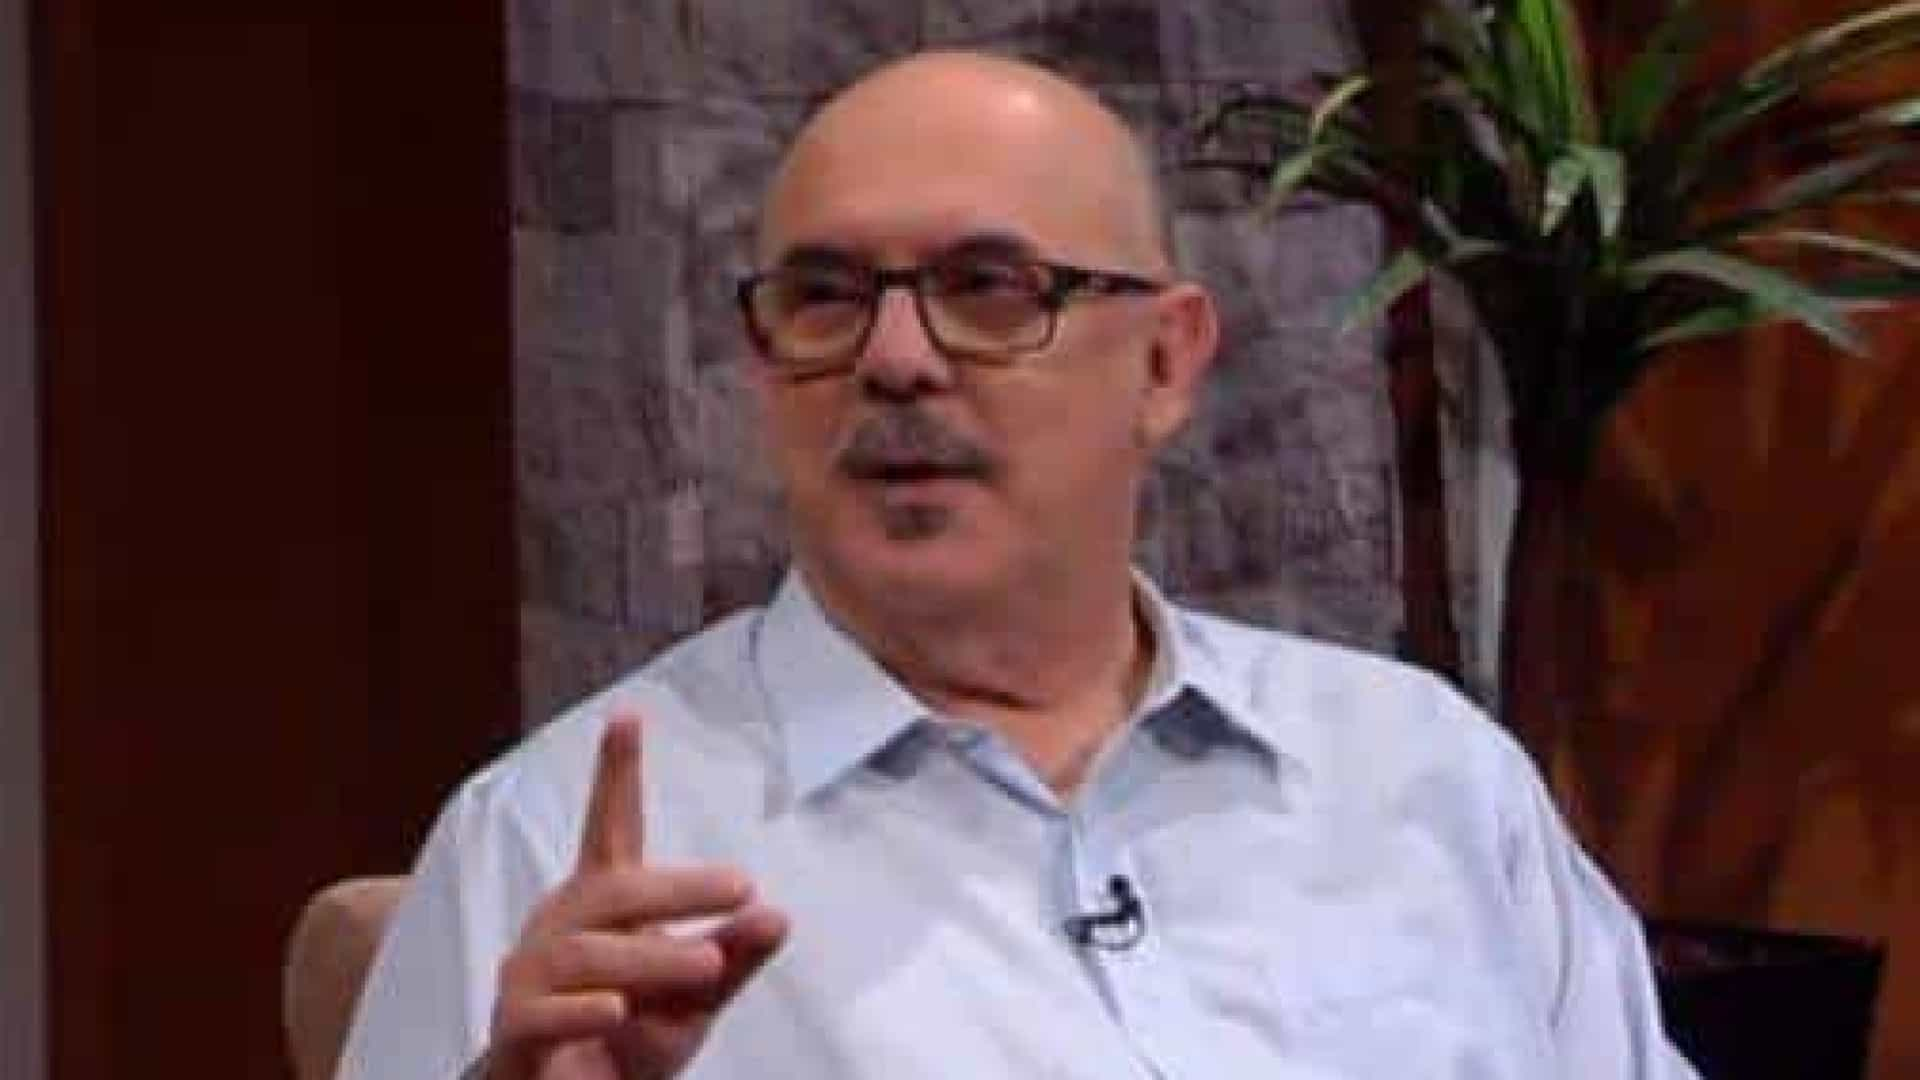 Novas universidades ensinam 'sexo sem limite', disse Milton Ribeiro